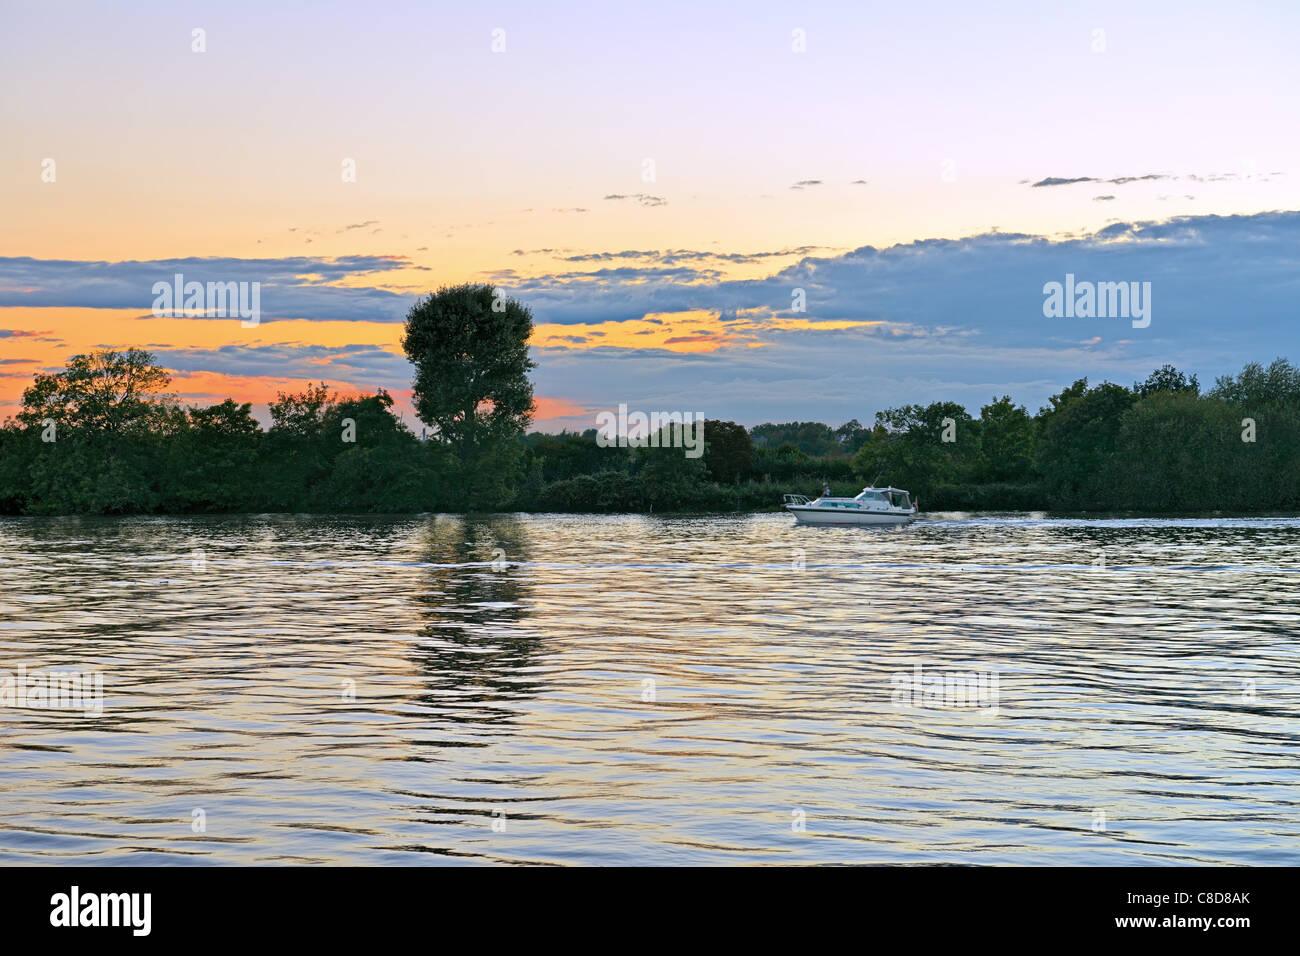 Boat cruising on River Thames, Hammersmith, London, at sunset - Stock Image